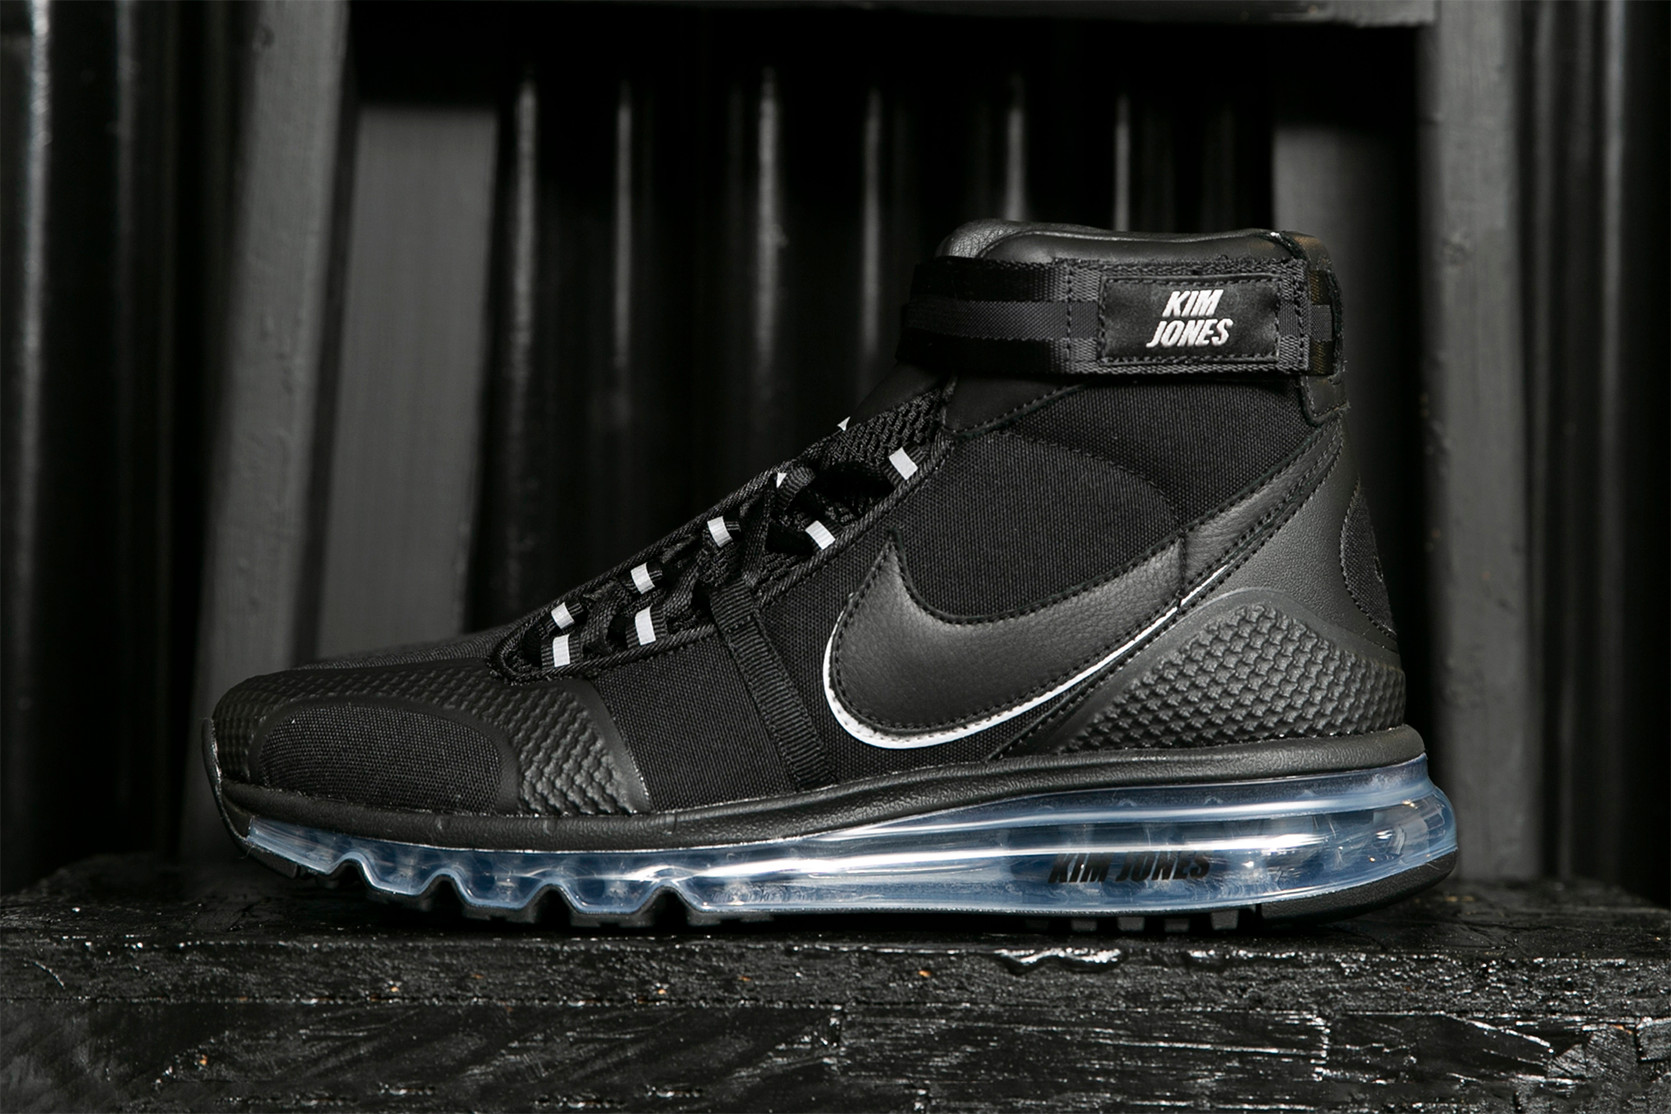 Kim Jones x NikeLab Collection